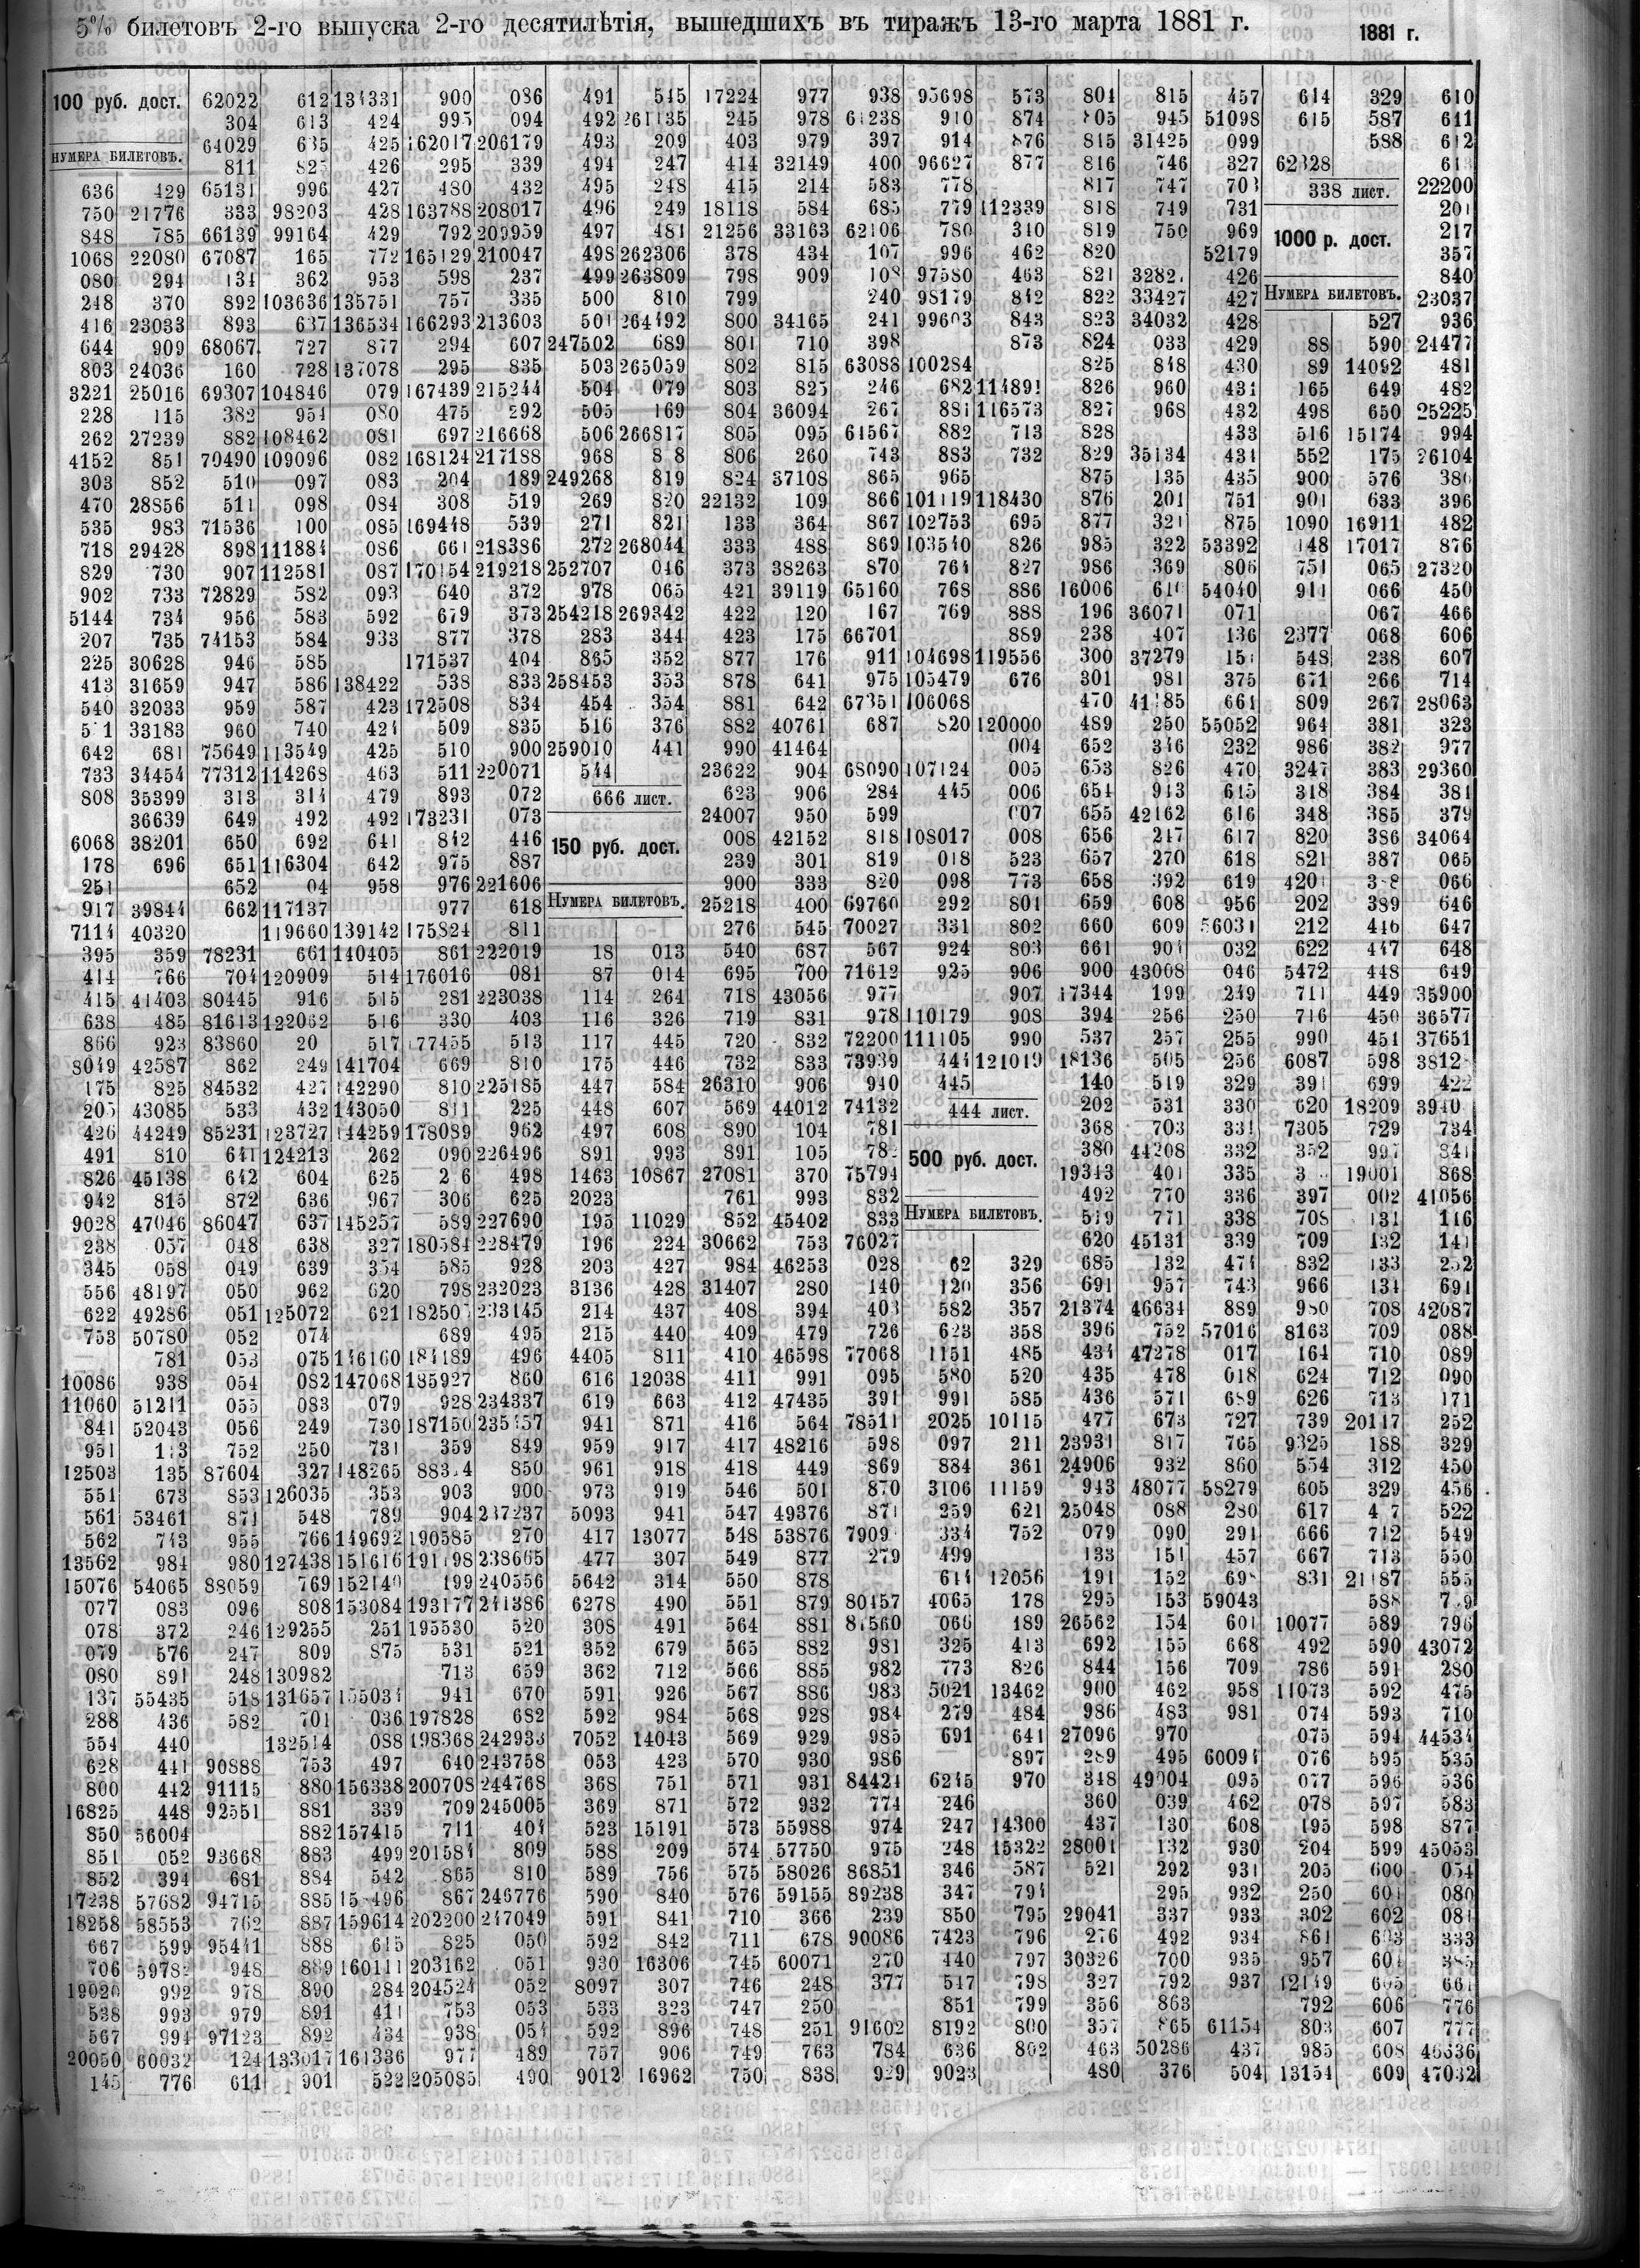 217237 essay Access statistics for wwwcsbuedu last updated: sun, 25 oct 1998 04:30:20 (gmt -0400) daily transmission statistics hourly transmission statistics.